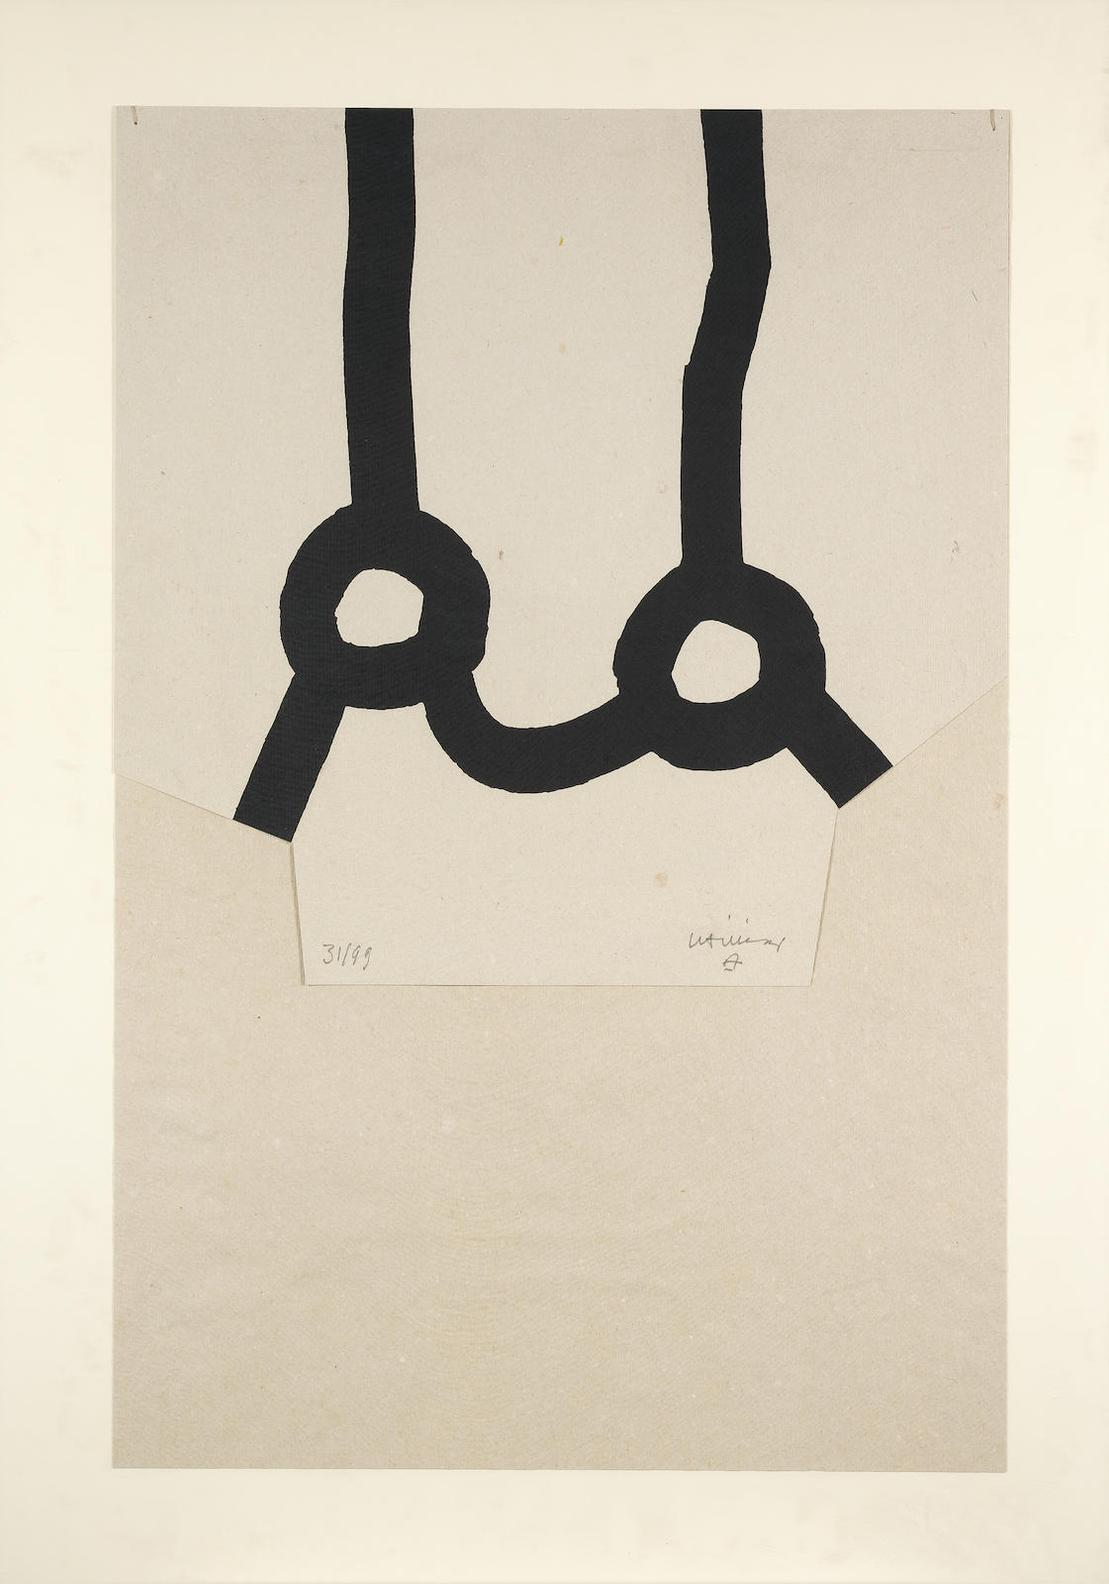 Eduardo Chillida-Homenaje A Joan Prats (Koelen 87020)-1987